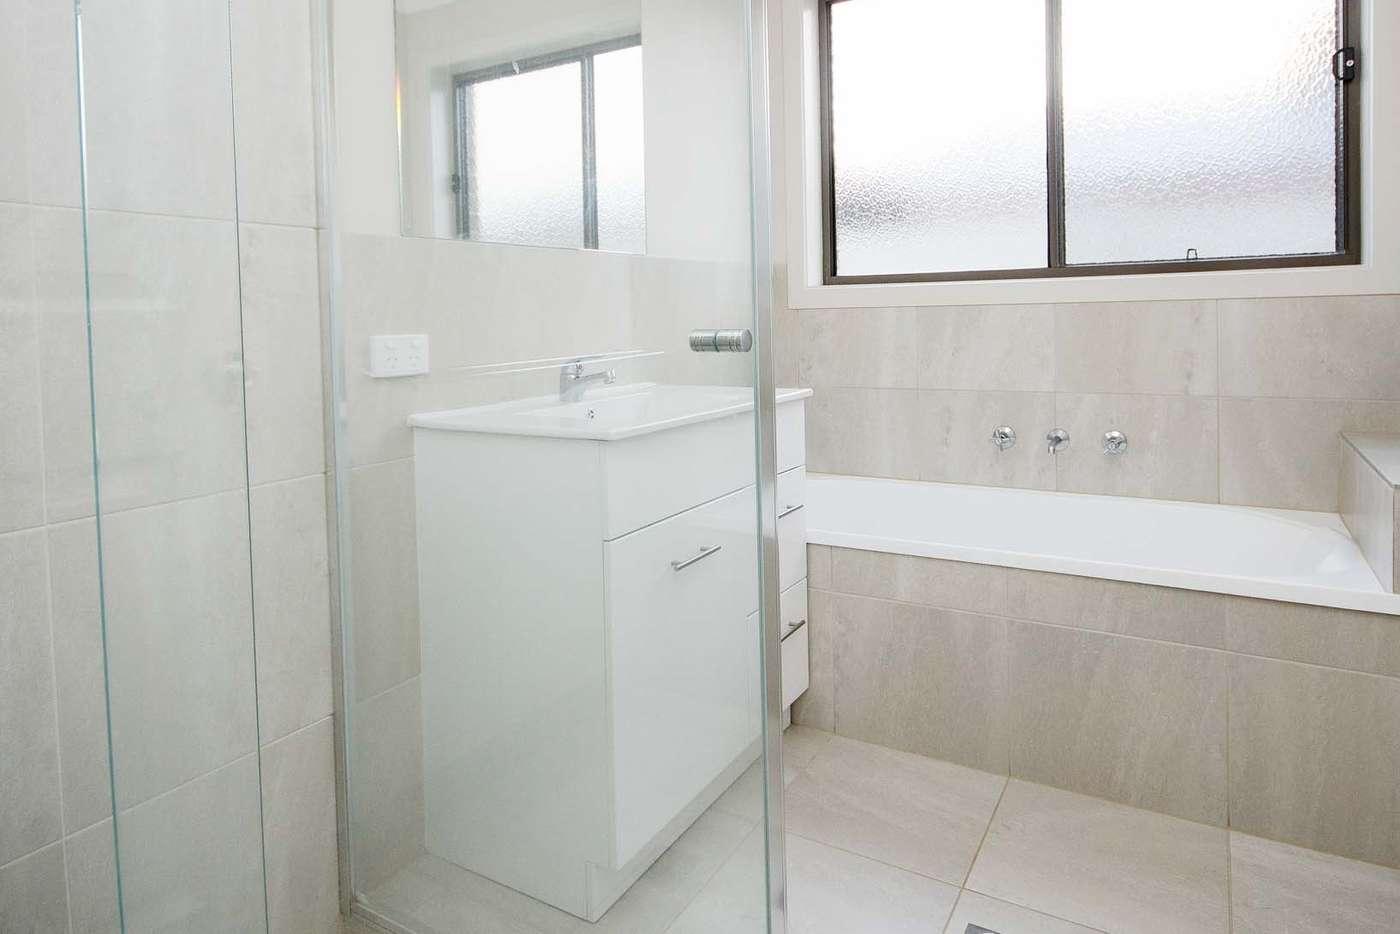 Sixth view of Homely house listing, 37 Kenna Street, Wodonga VIC 3690